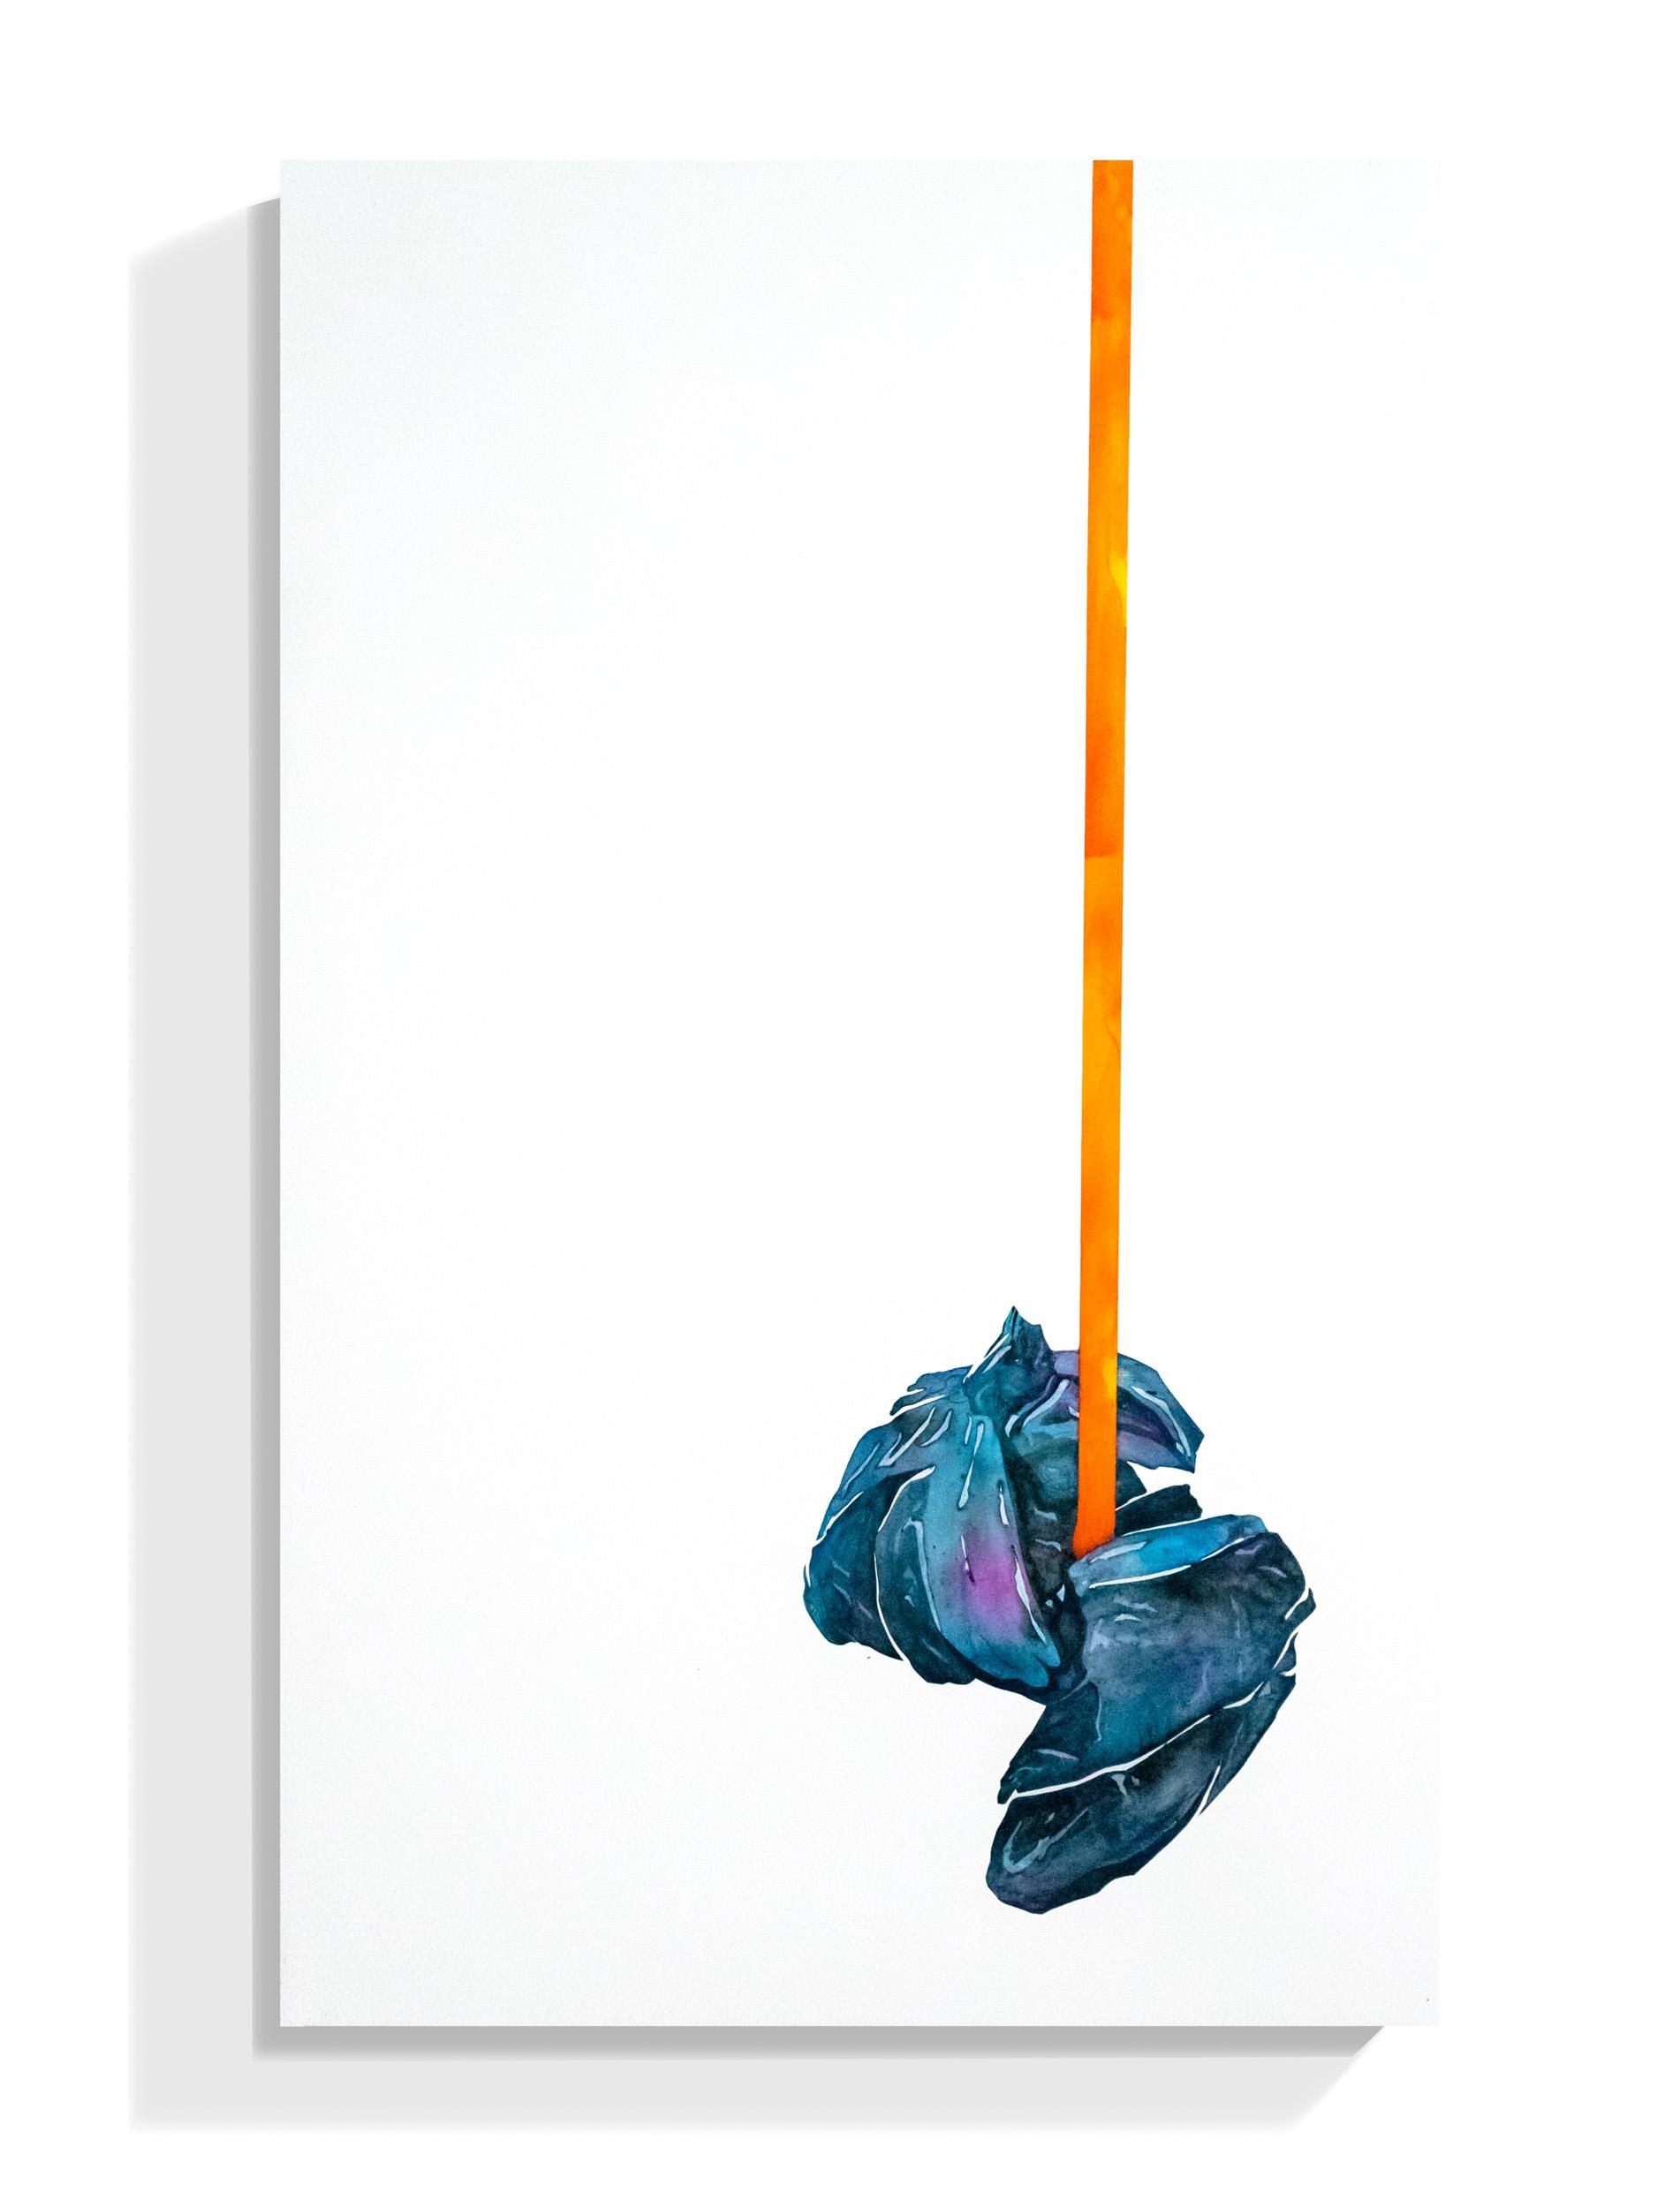 wassaic-project-artist-ryder-richards-trash-painting-drill-2018-09-18-21-03-19.jpg